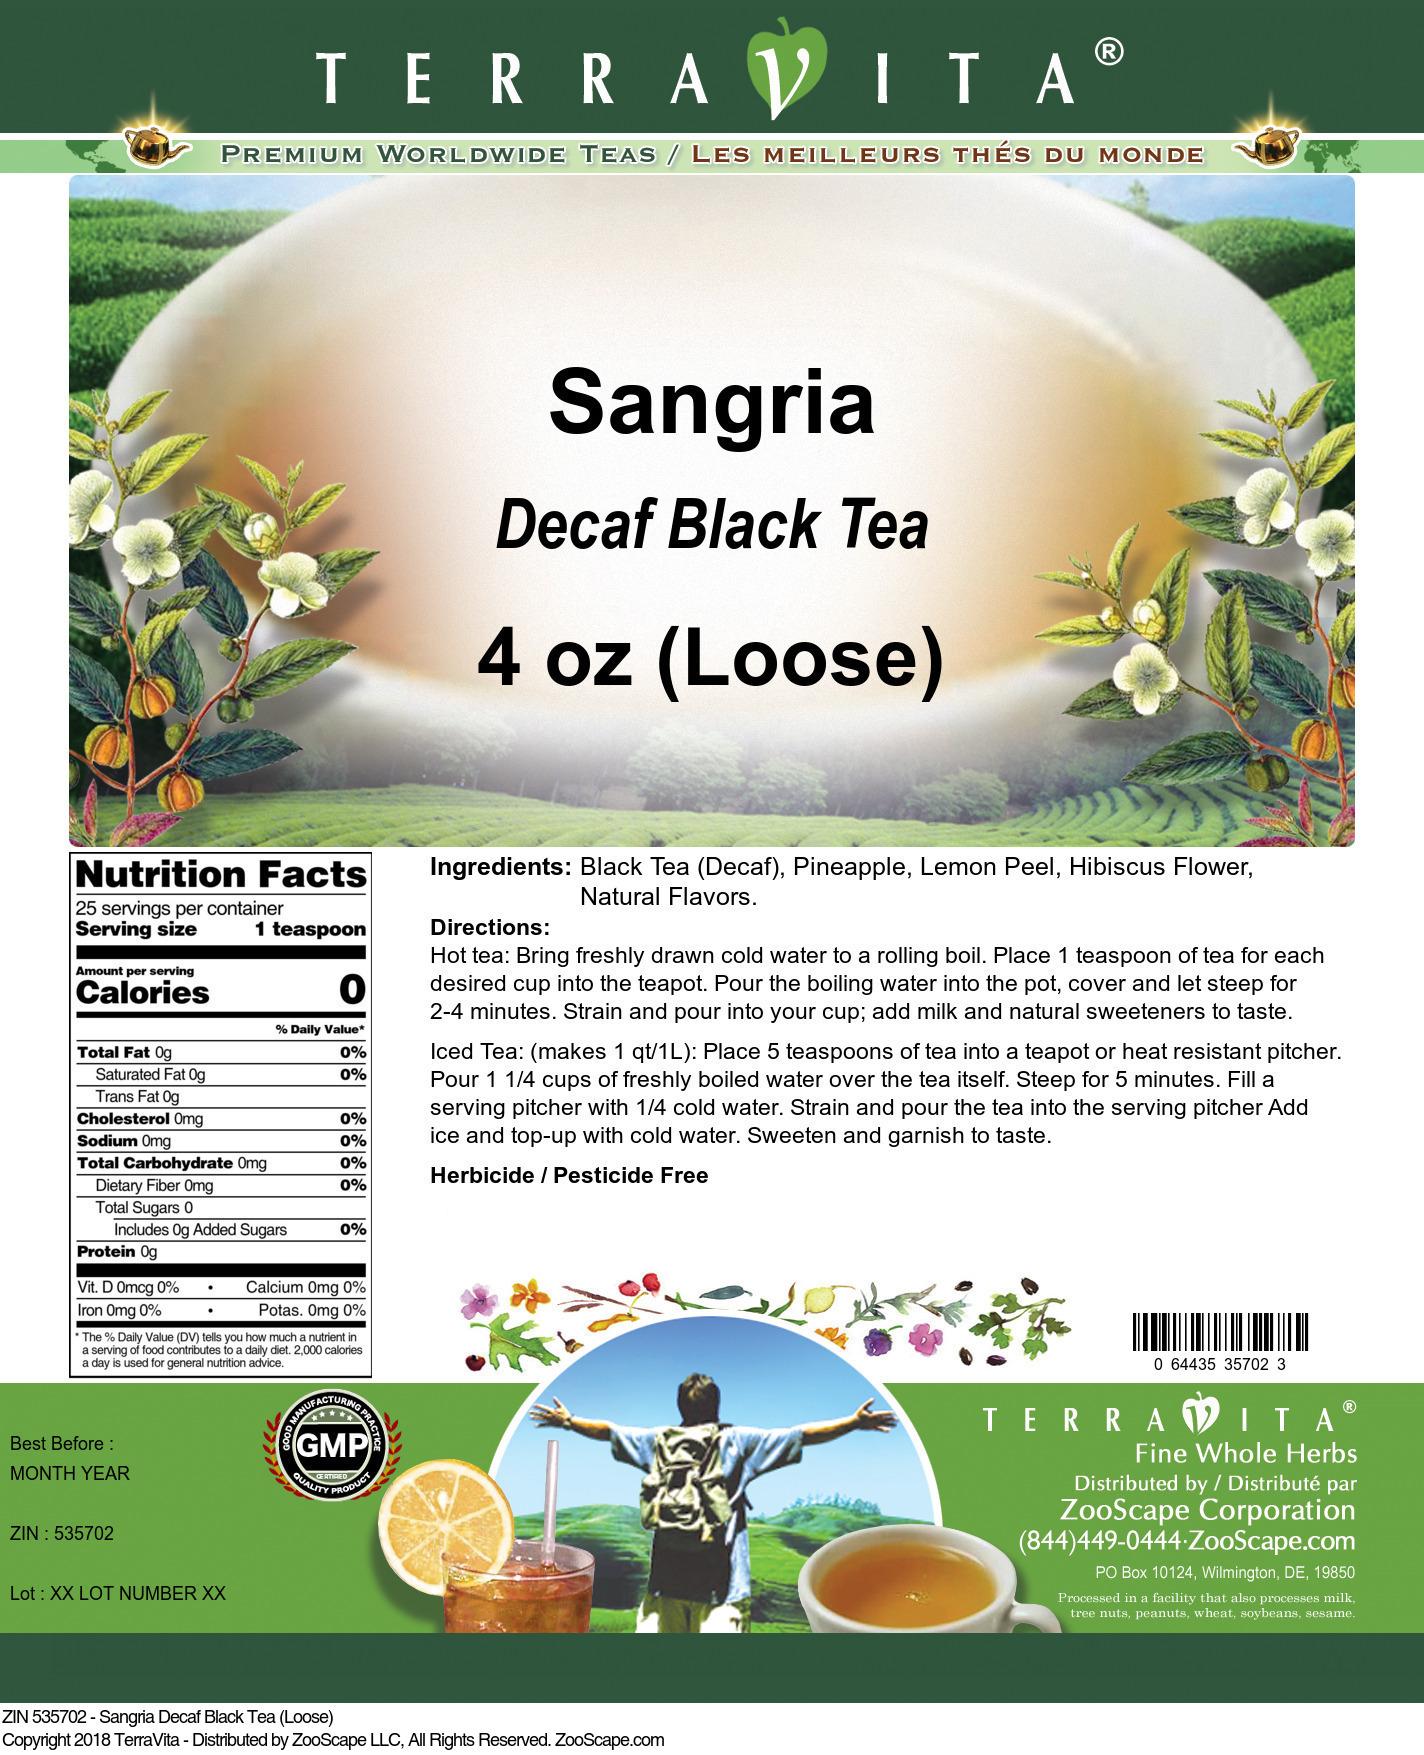 Sangria Decaf Black Tea (Loose)